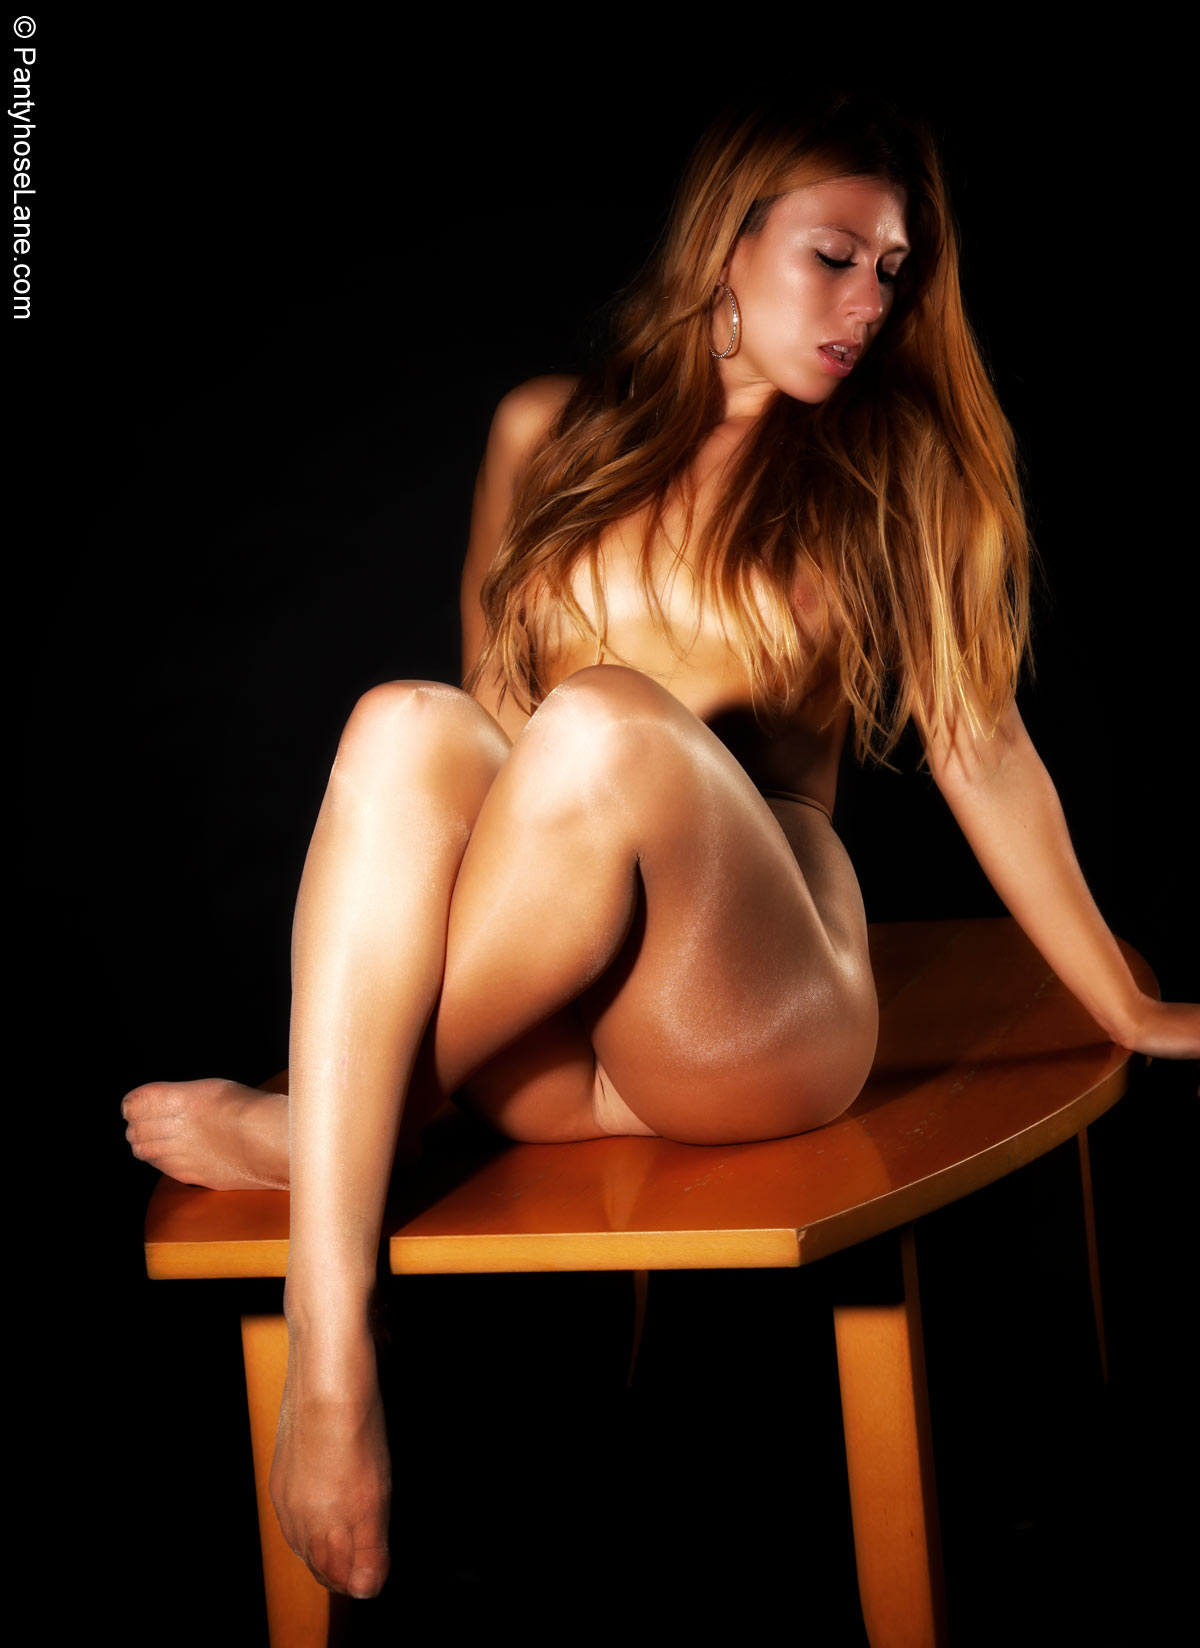 Hot nude mature women